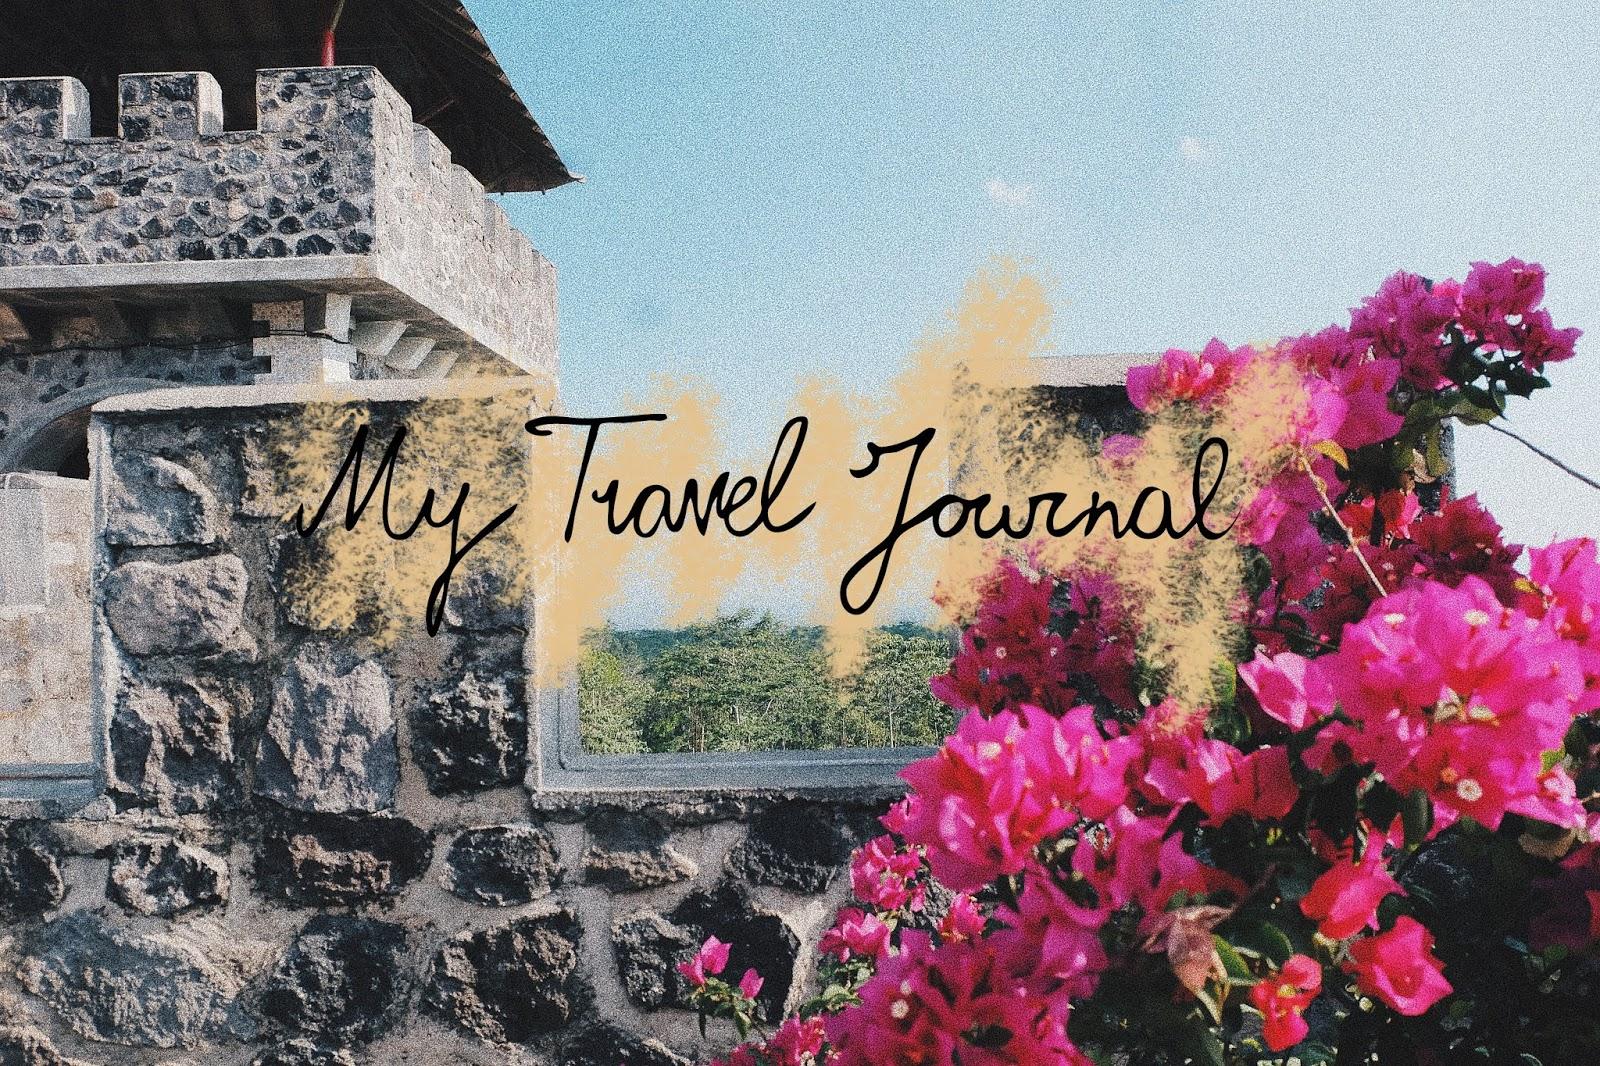 The Lost World Castle, Jogja - Journey of the Week